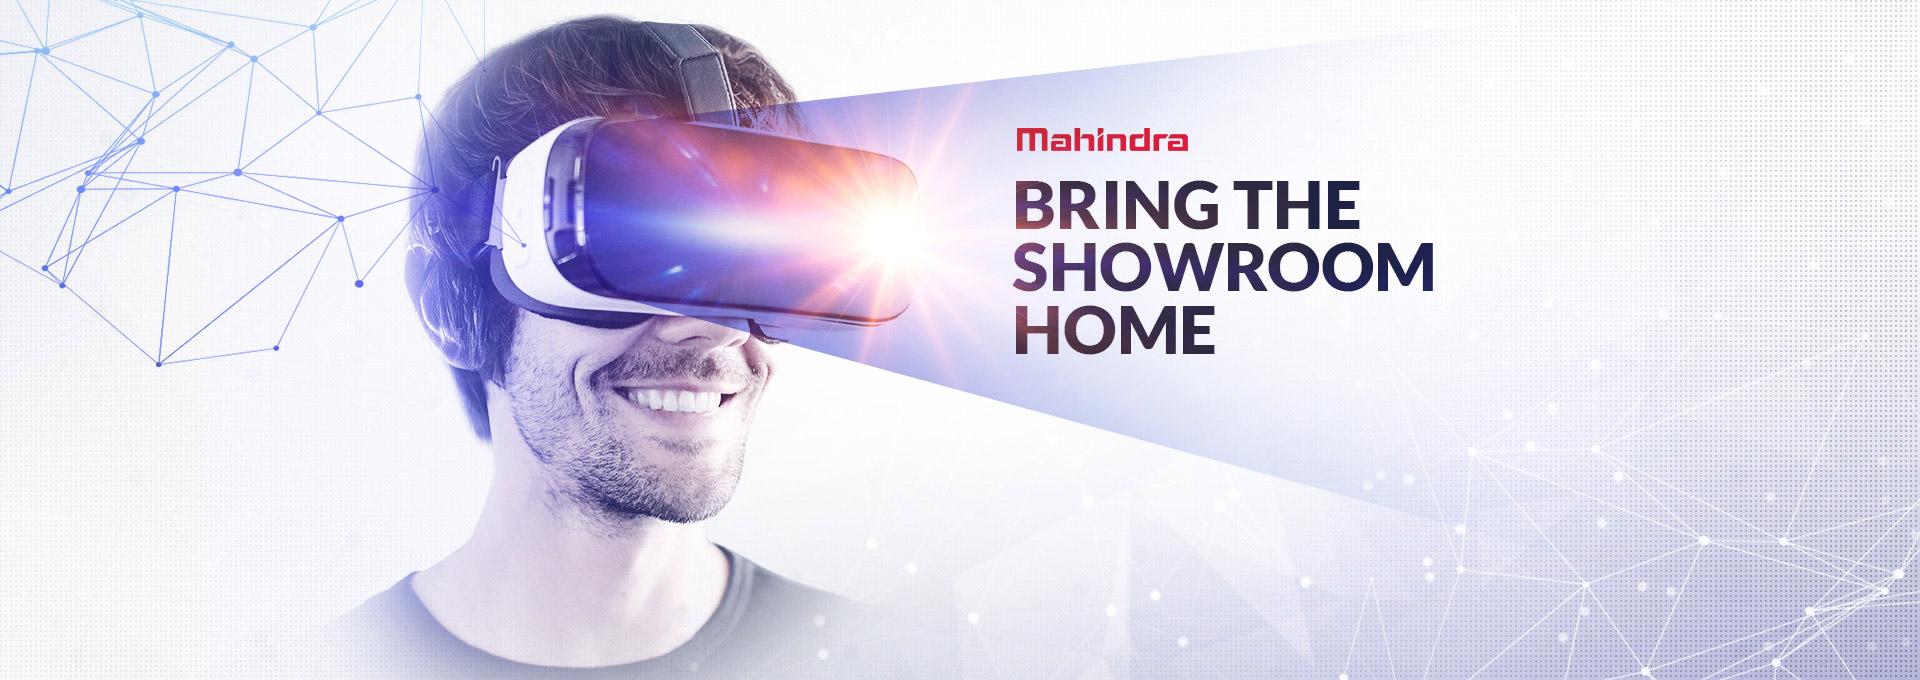 Automotive Mahindra Bring Showroom Home